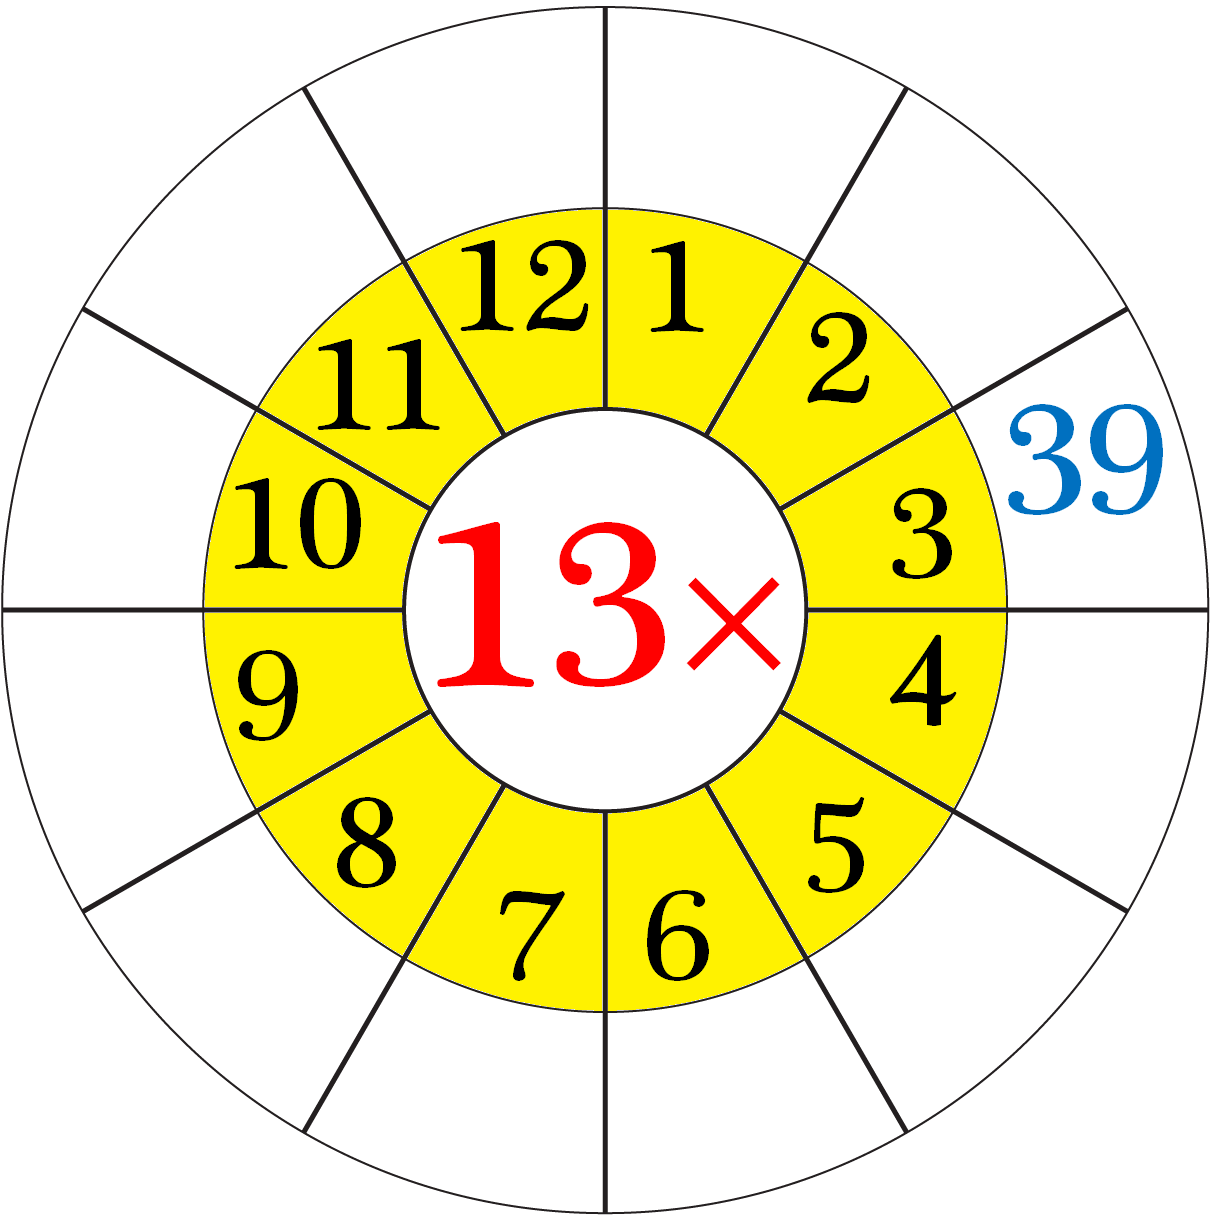 Worksheet on Multiplication Table of 13